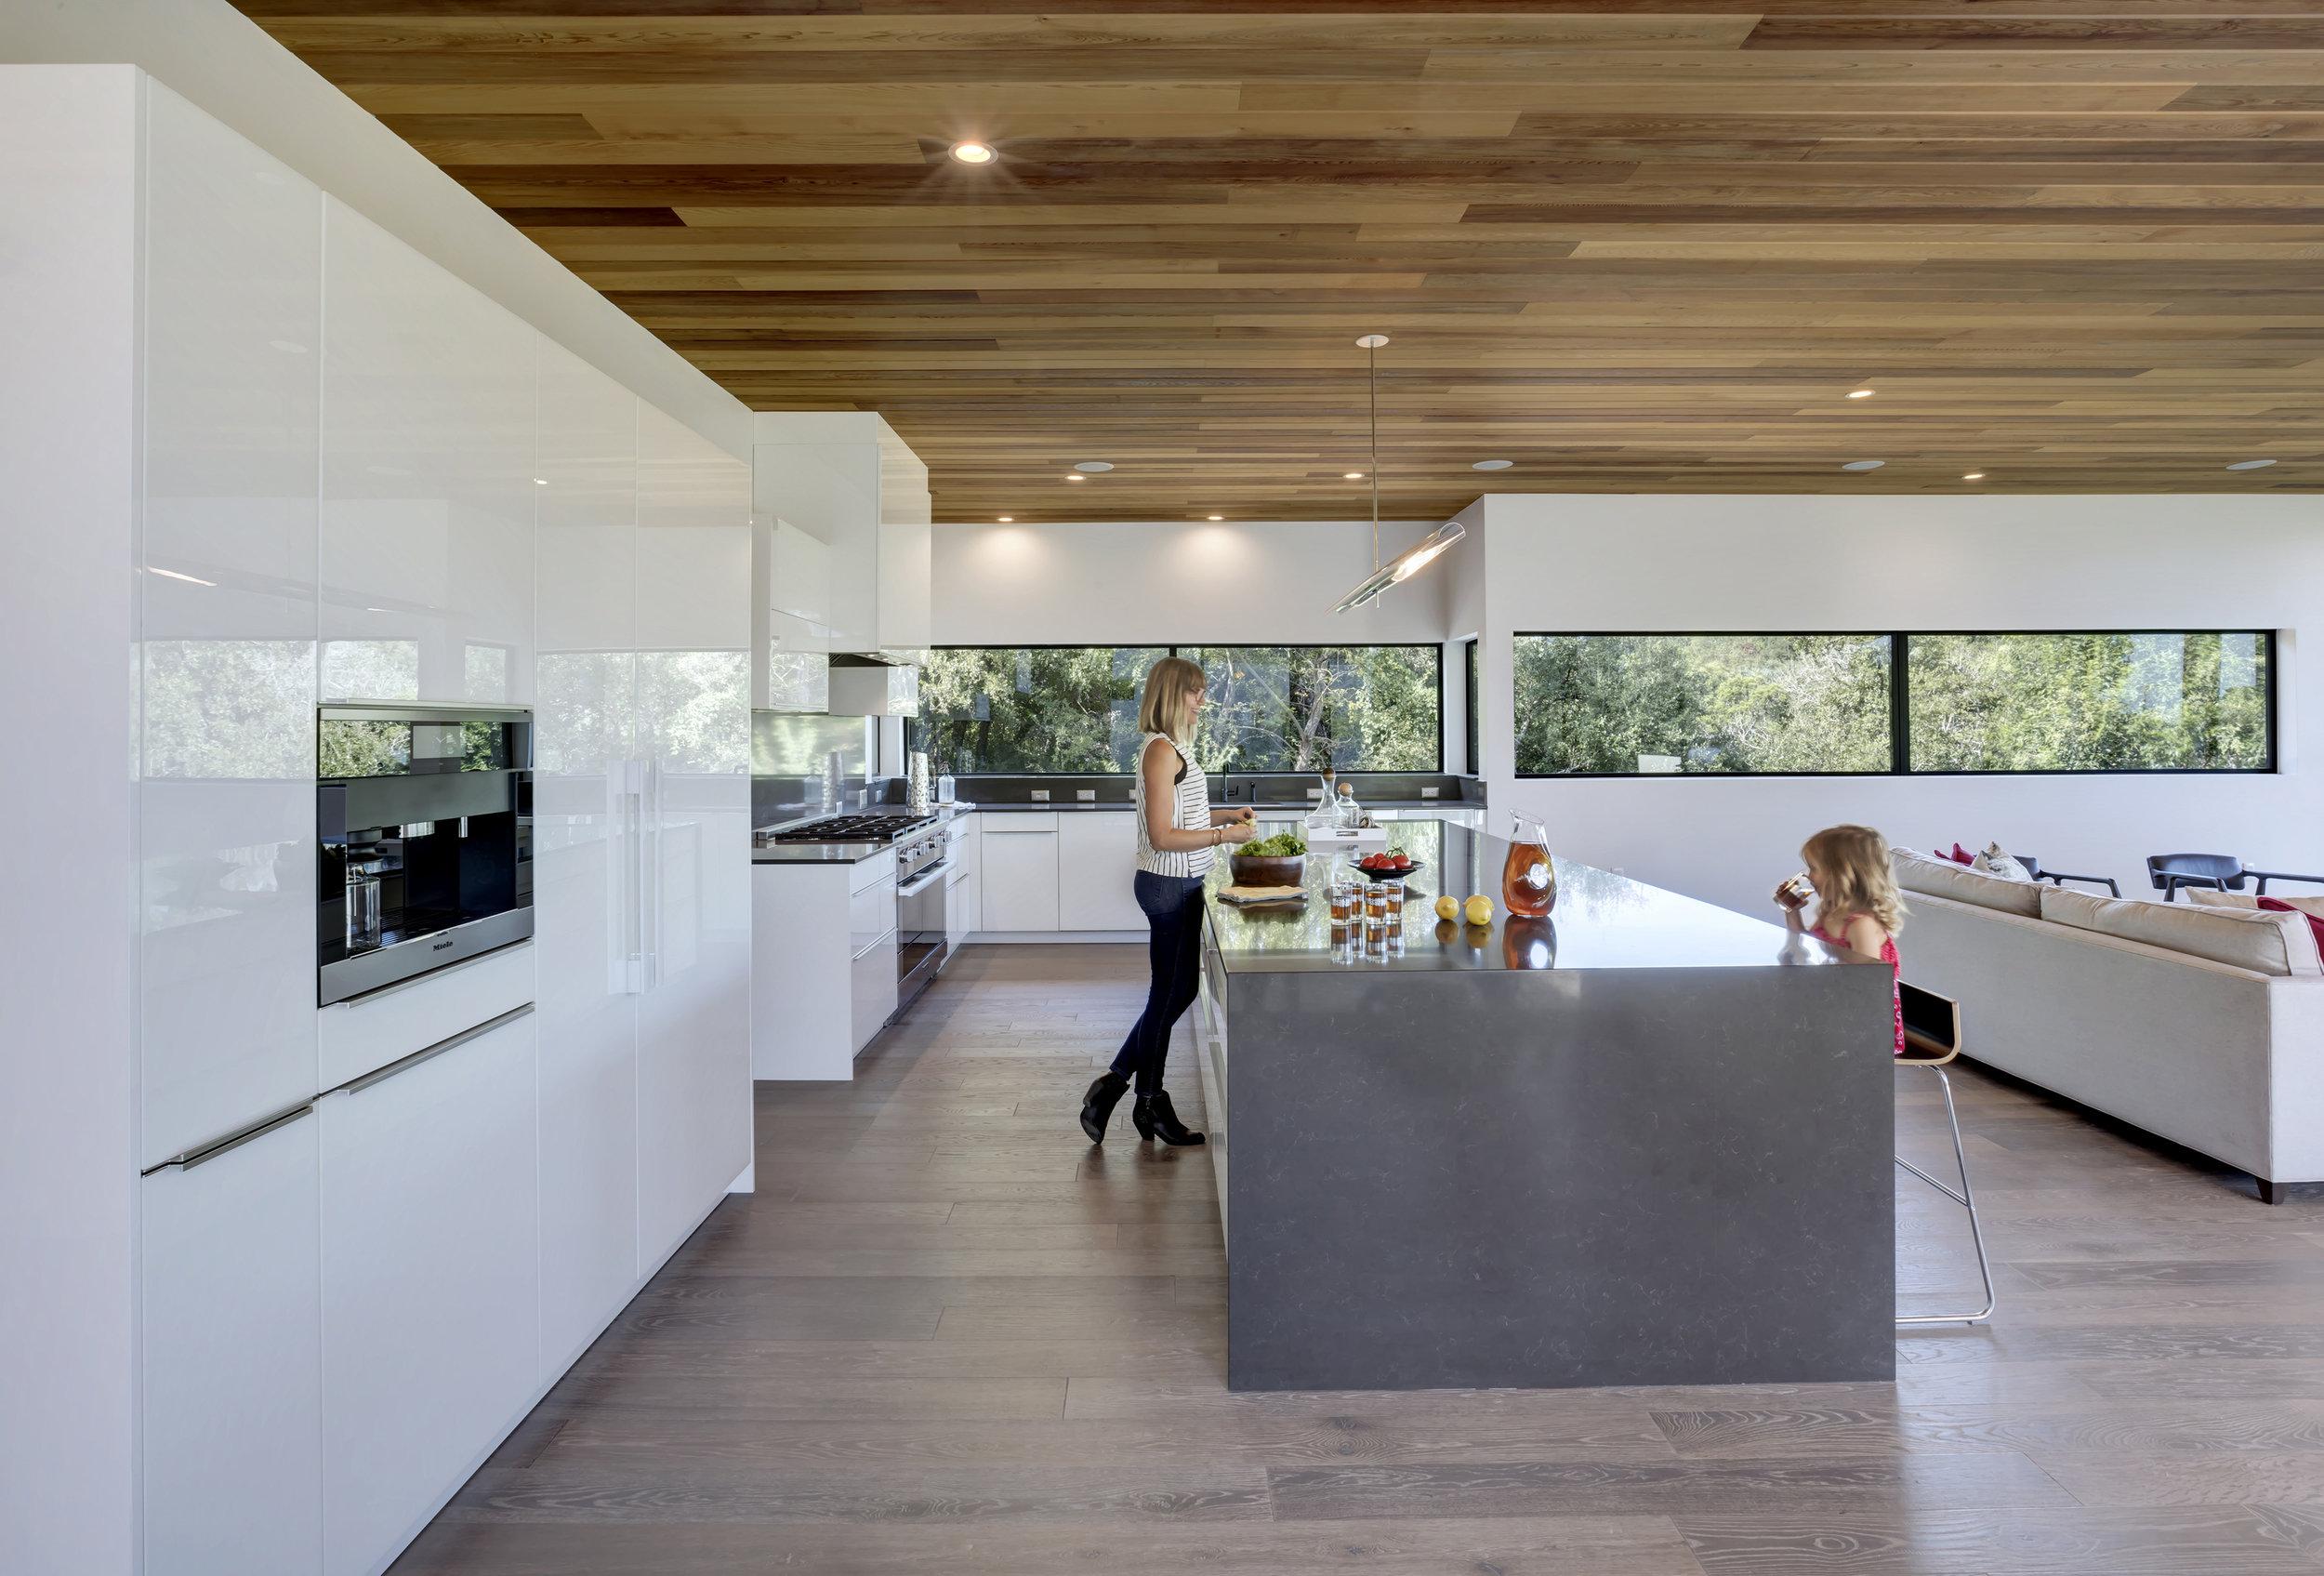 Matt Fajkus MF Architecture Bracketed Space House 16 by Charles Davis Smith.jpg